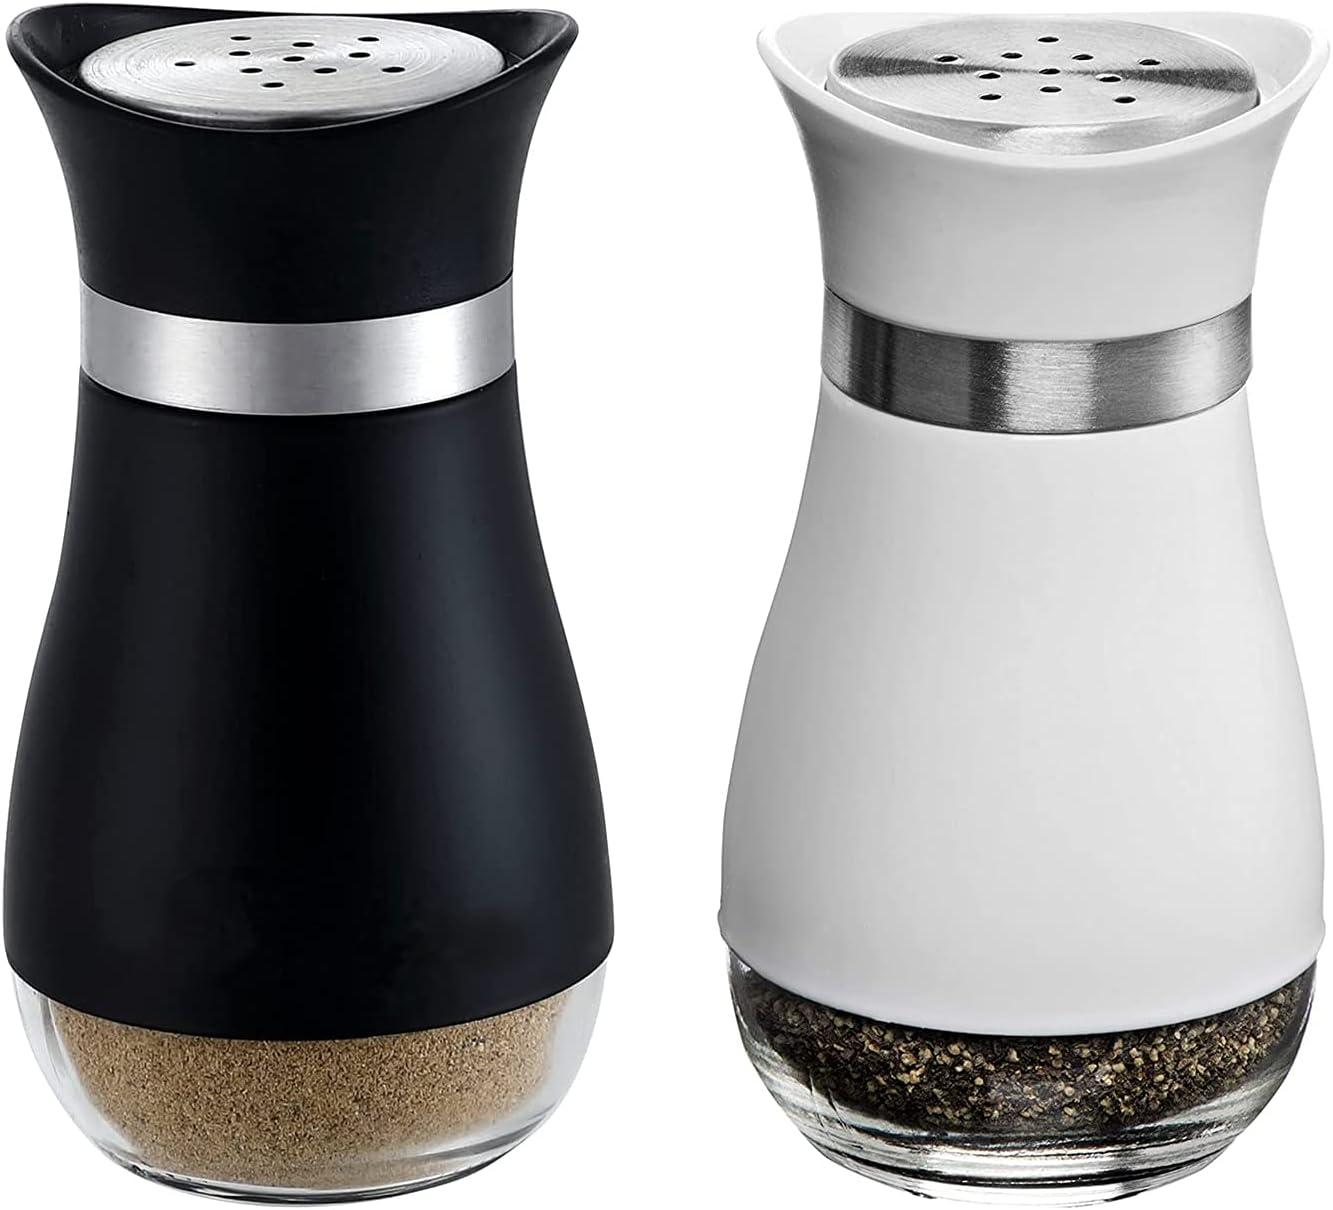 Rarapop 2 Pack Classic Salt and 4OZ Shakers Pepper Portland gift Mall Refillab Set